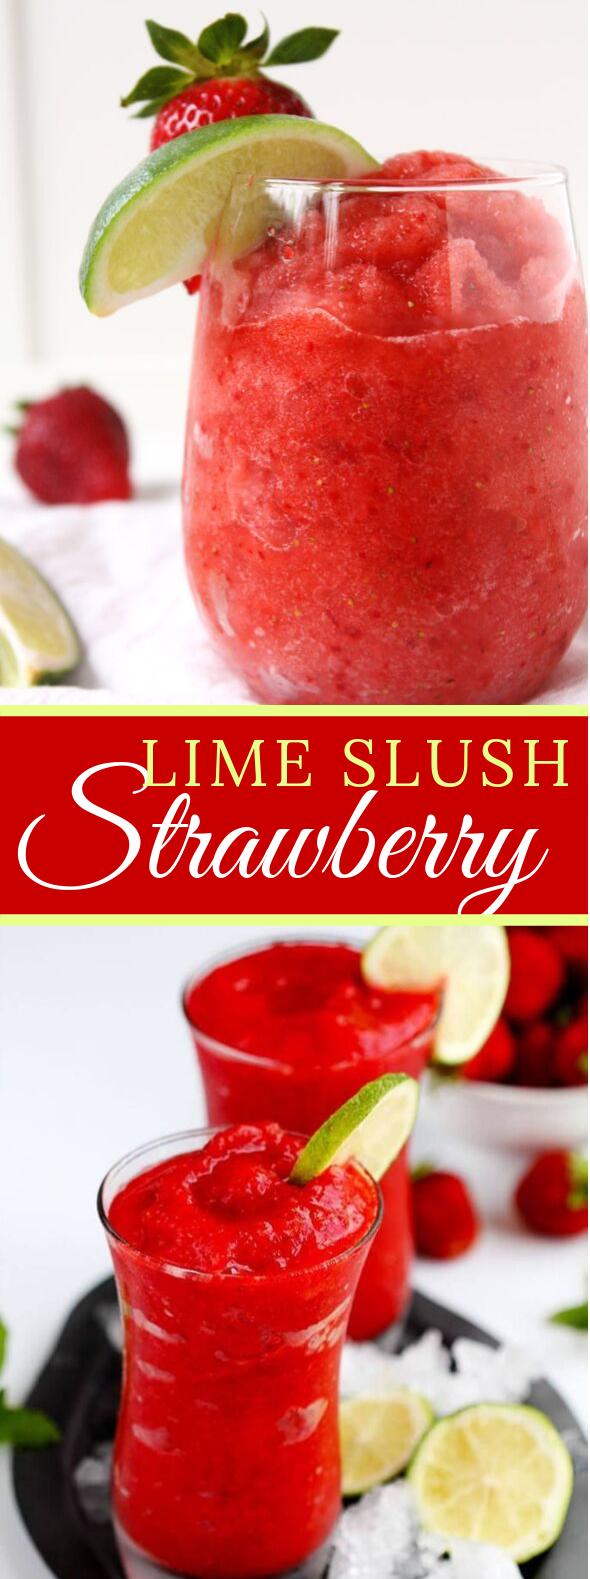 STRAWBERRY LIME SLUSH #drinks #summerdrink